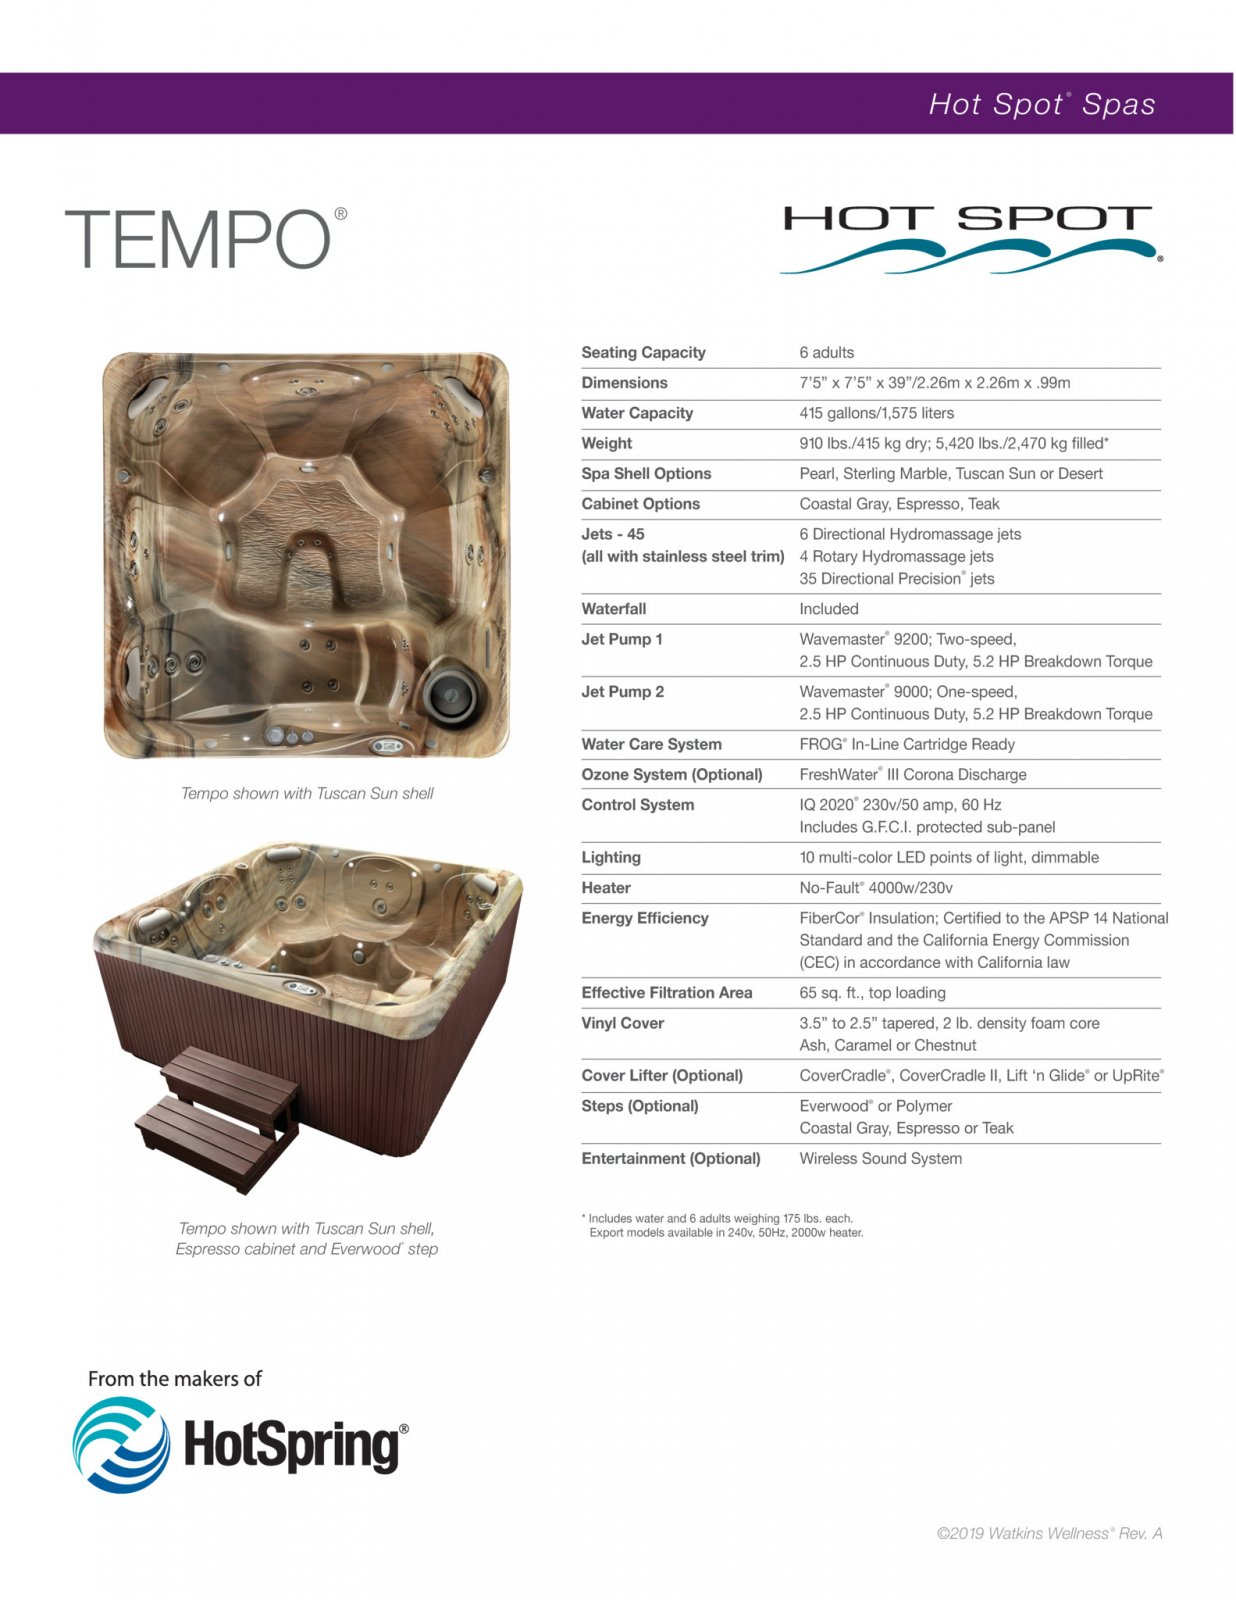 Tempo spa Tuscan Sun shell